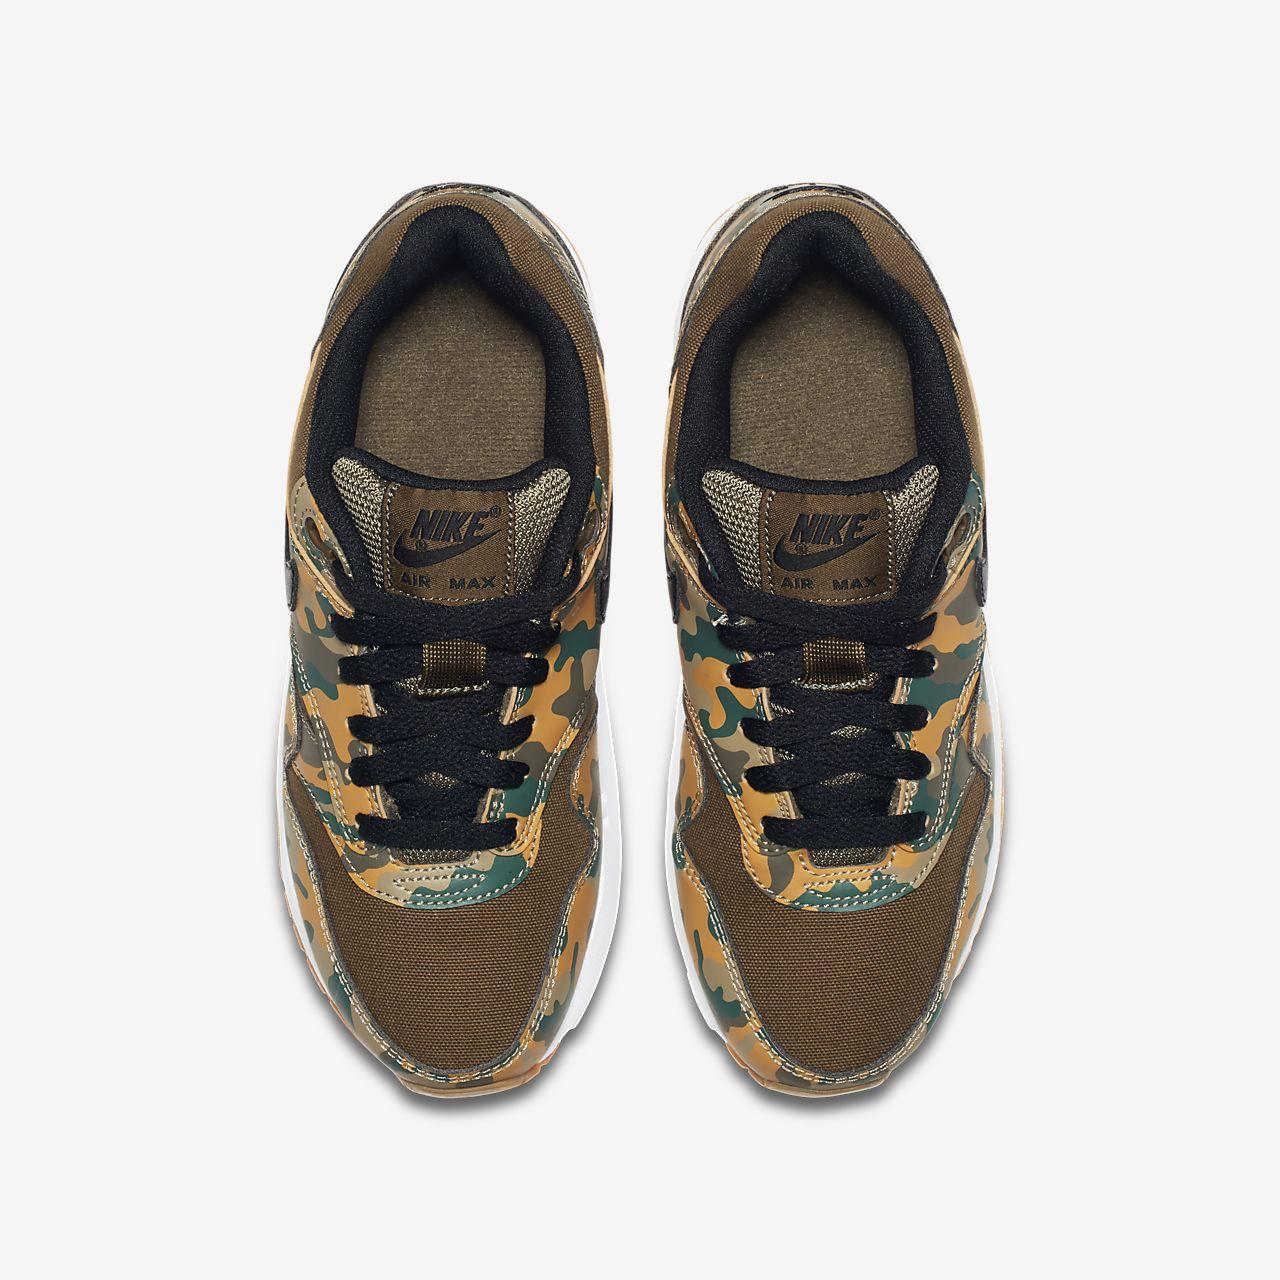 Nike Air Max 1 Print Schuh für ältere Kinder